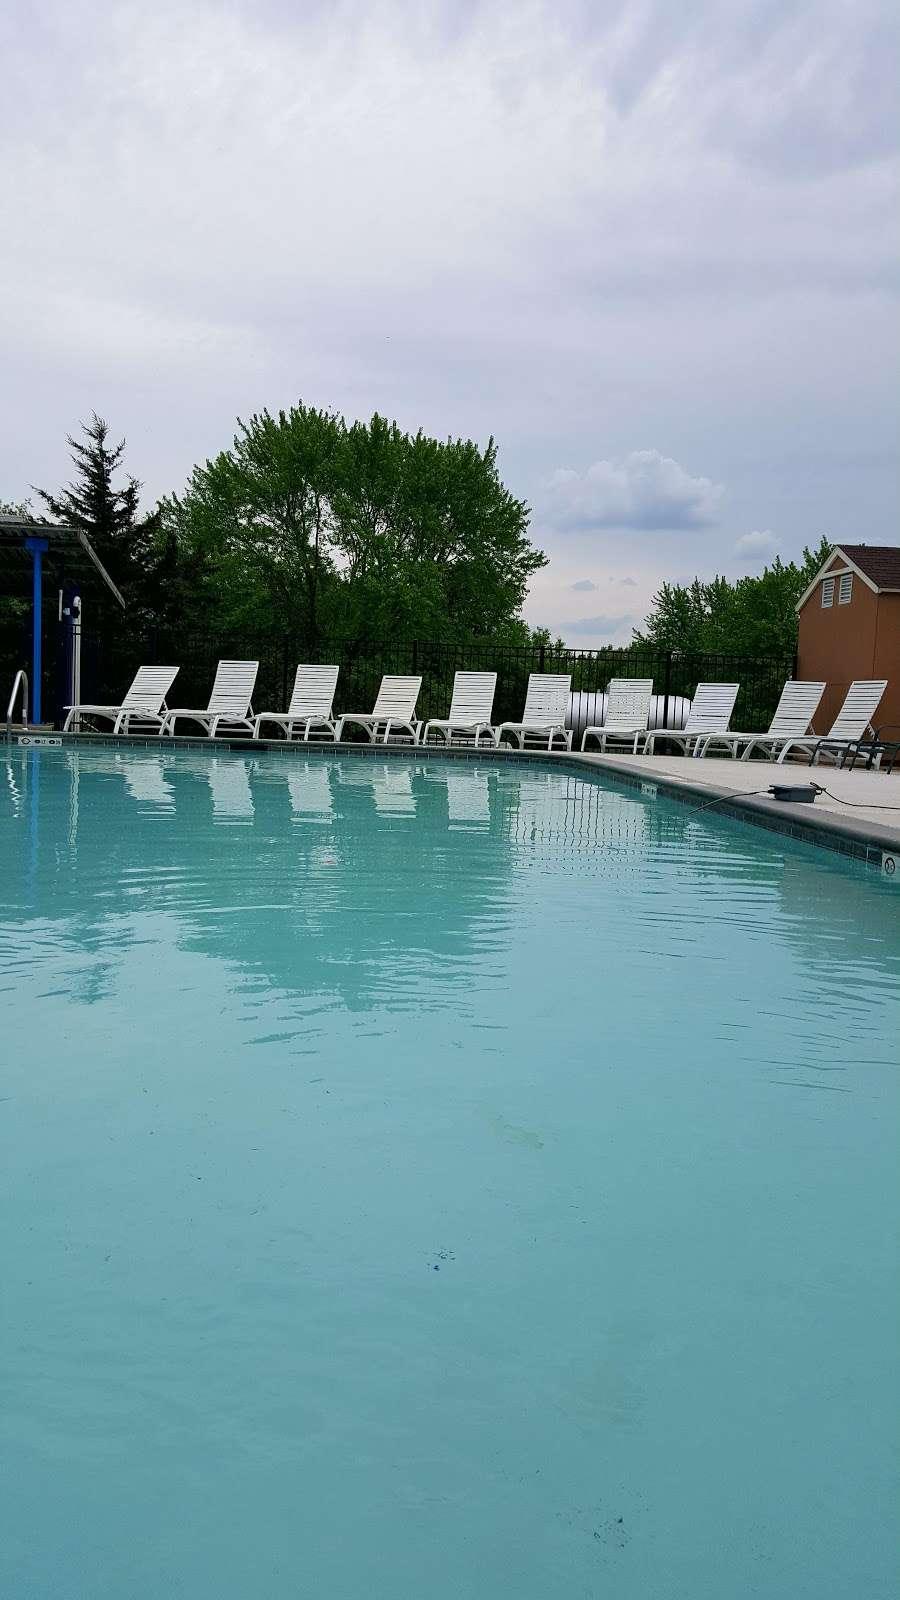 Sun Ray Hills - campground  | Photo 2 of 10 | Address: 7148 McHenry St, Burlington, WI 53105, USA | Phone: (262) 539-2592